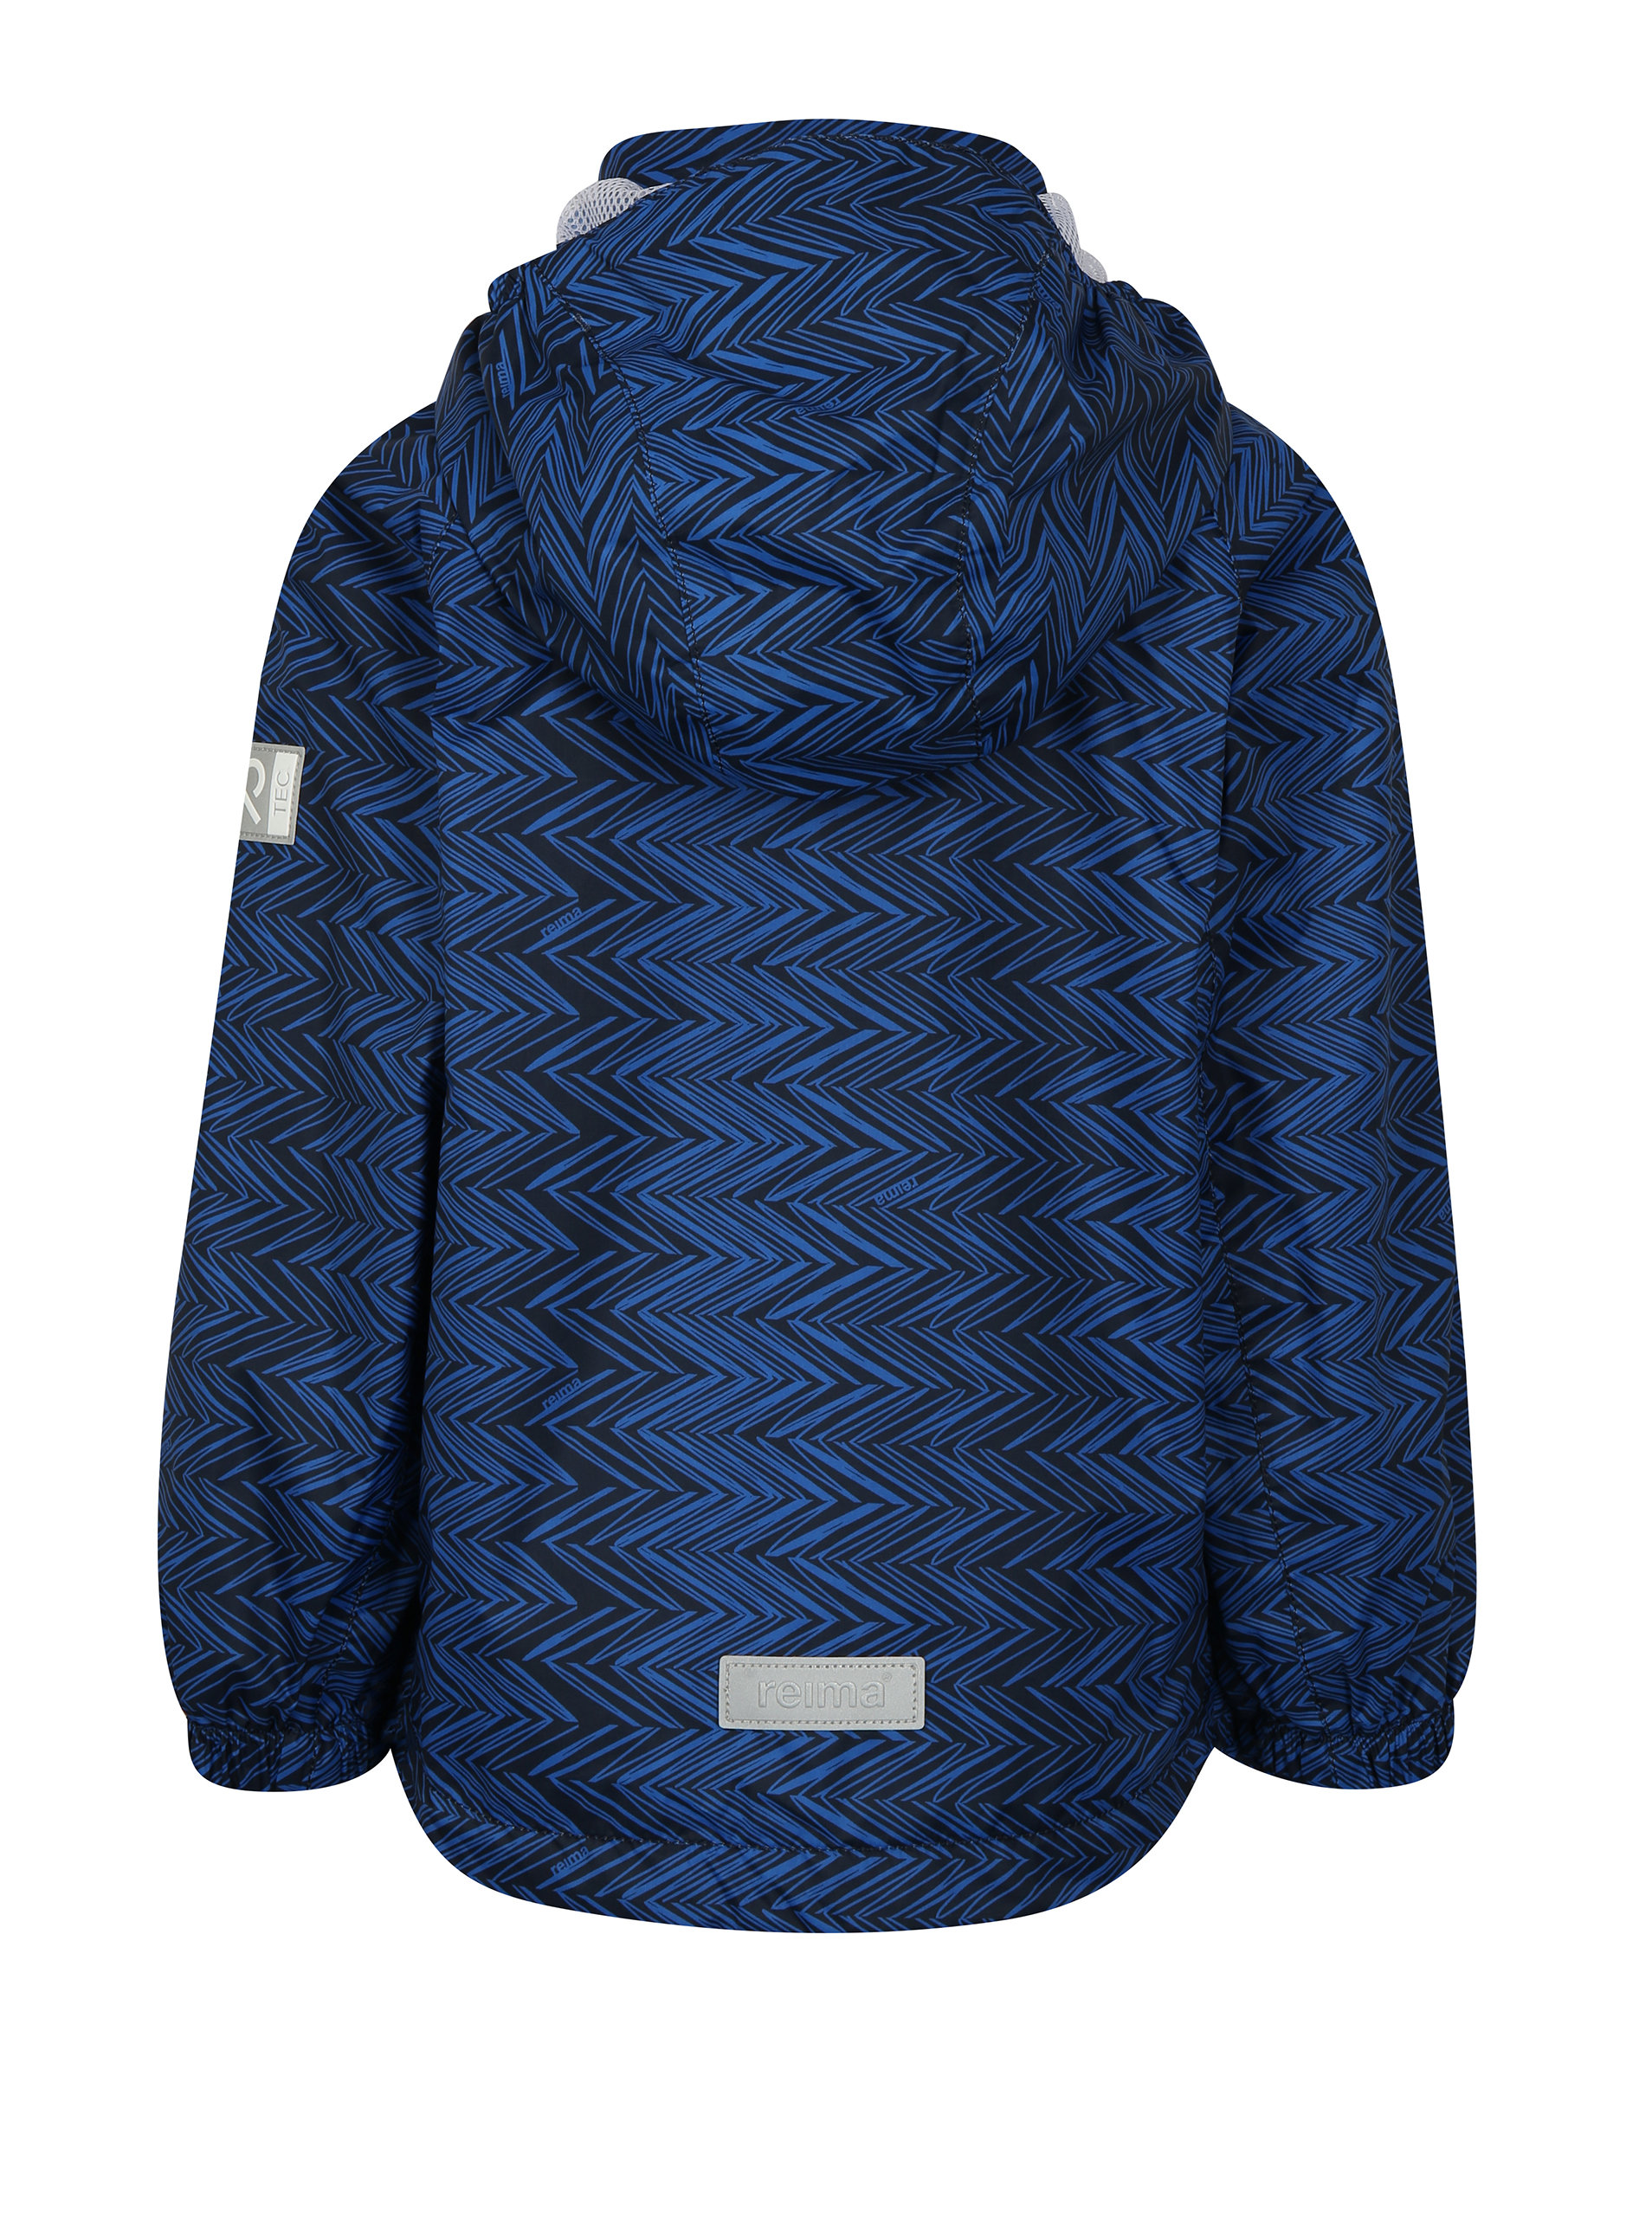 ed501666b99e4 Čierno–modrá chlapčenská funkčná bunda s kapucňou Reima Zigzag | ZOOT.sk